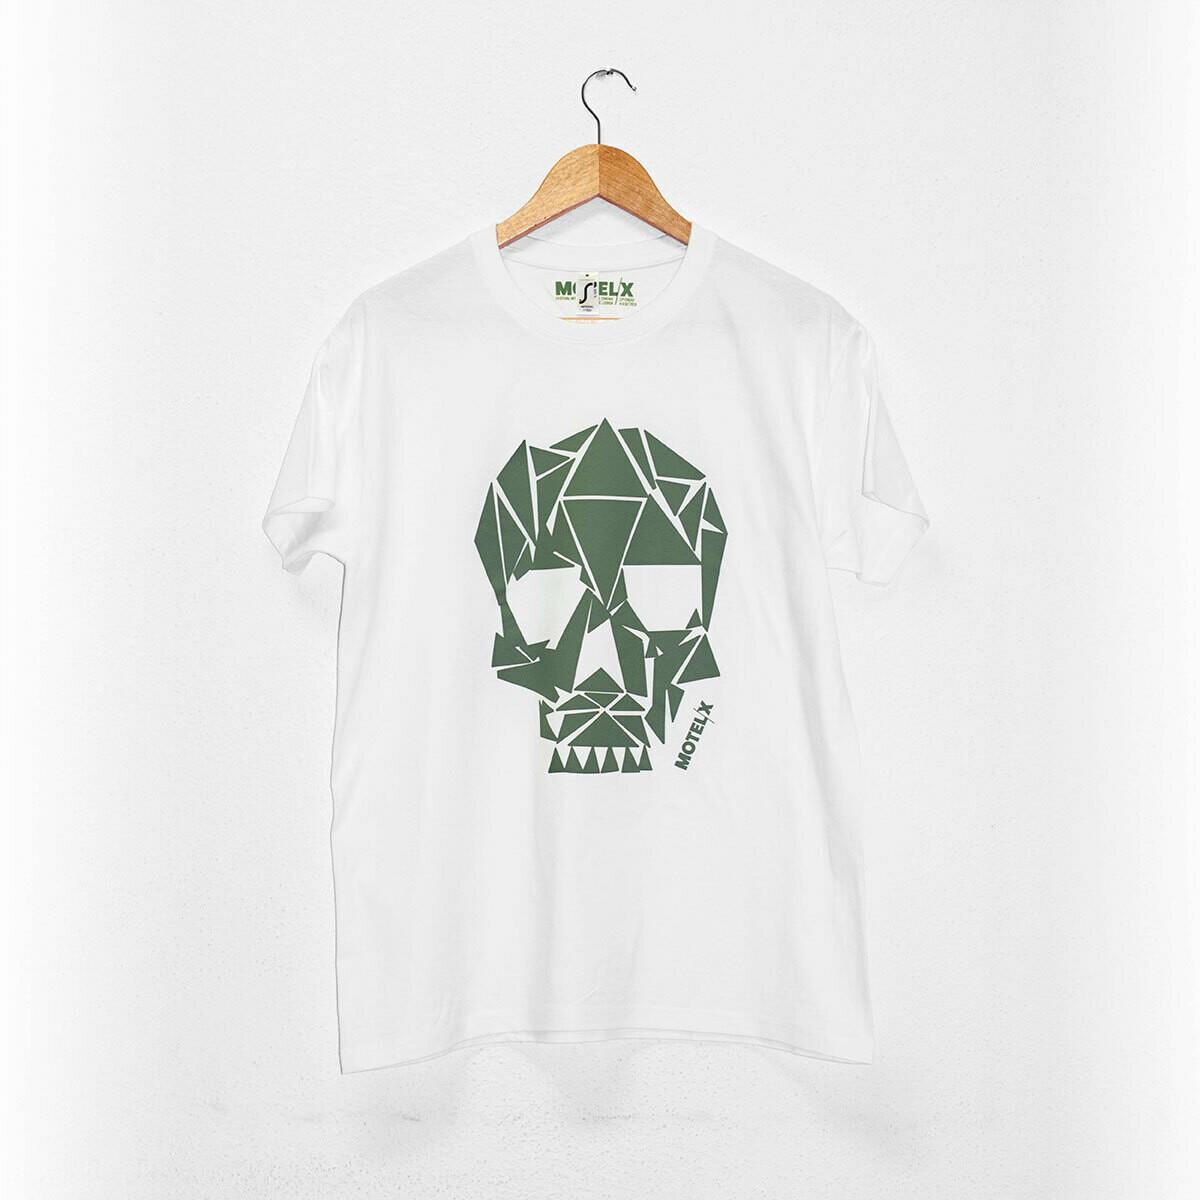 MOTELX 2018 Special Edition T-shirt Unisex / Skull / WHITE